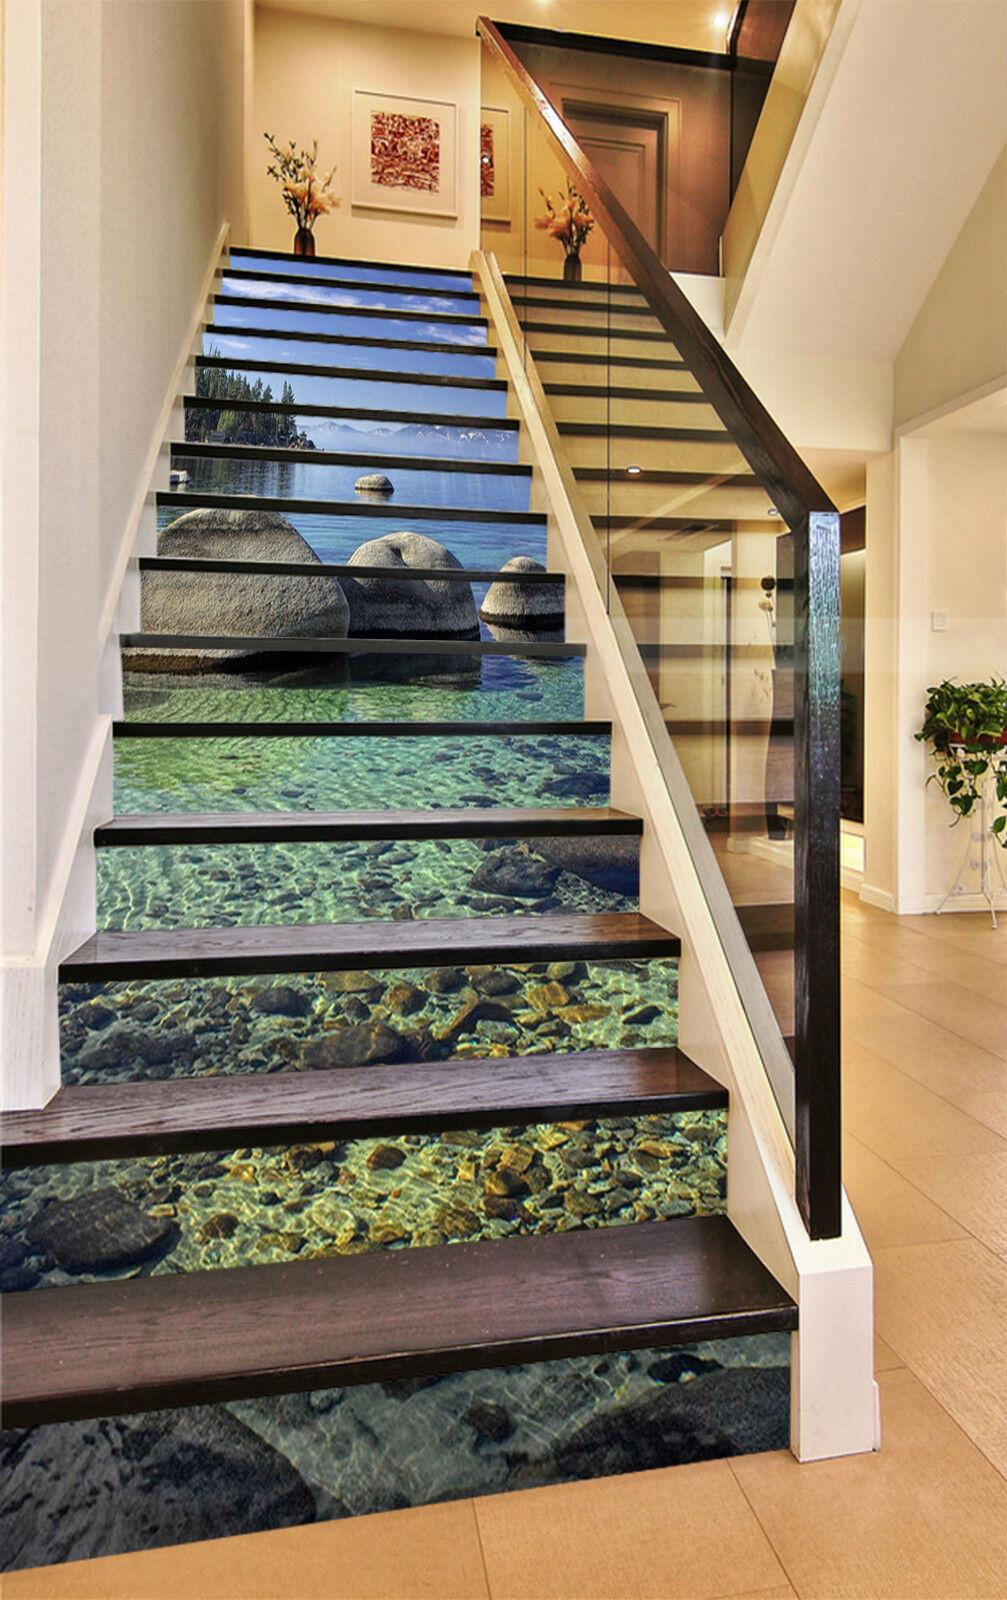 3D Meer Stein 684 Stair Risers Dekoration Fototapete Vinyl Aufkleber Tapete DE